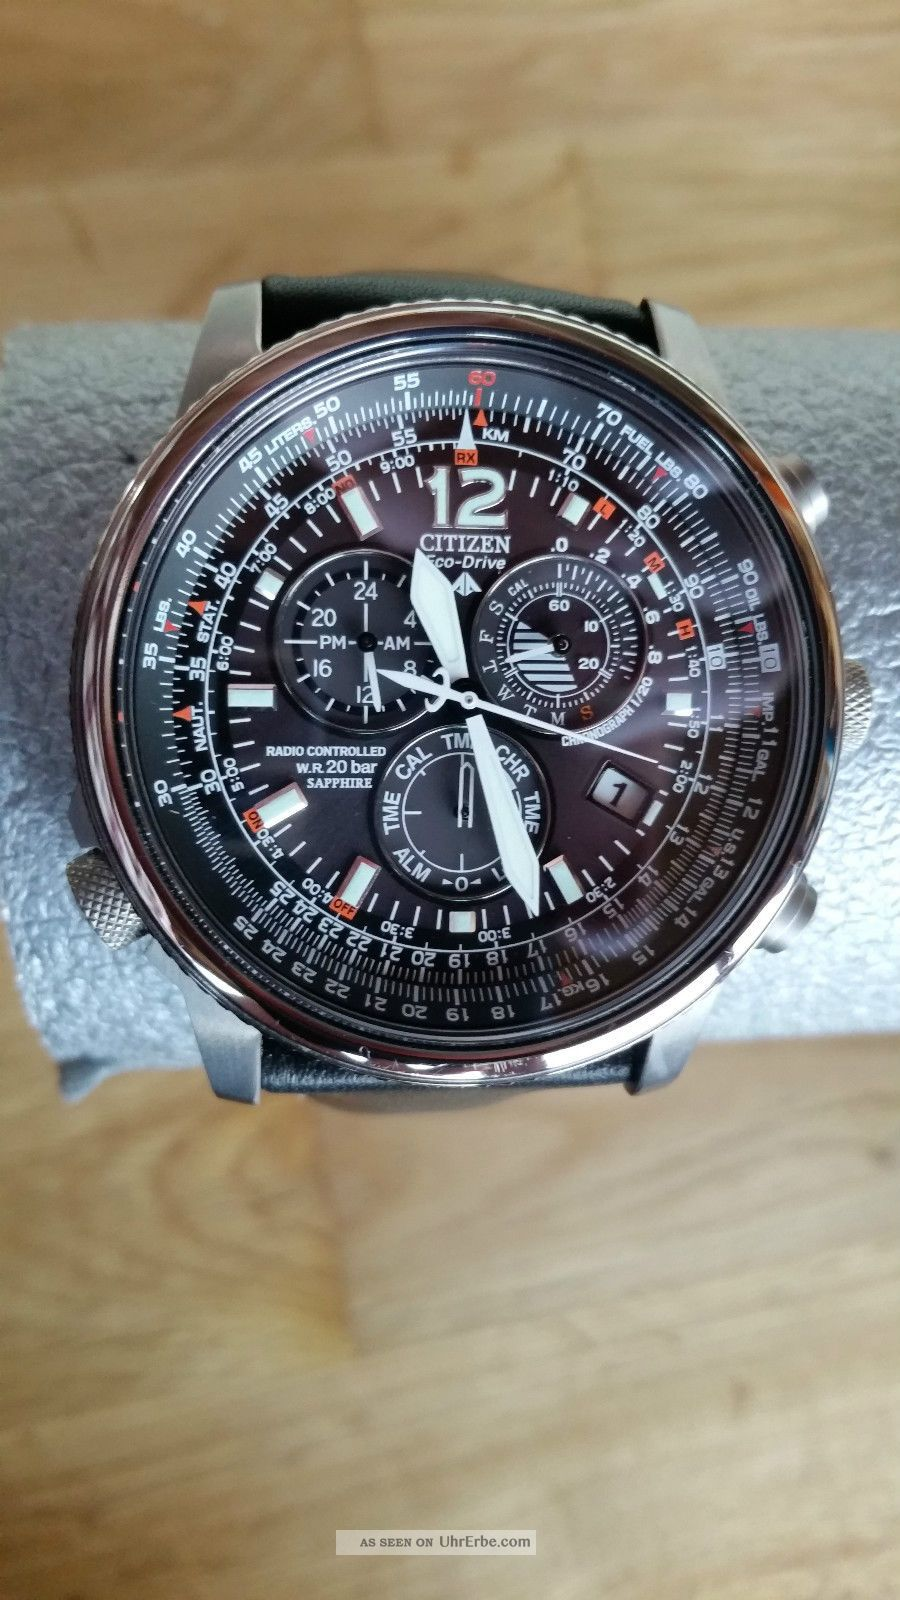 Citizen As4050 - 01e Promaster Chrono Pilot Titanium Neuwertig Armbanduhren Bild